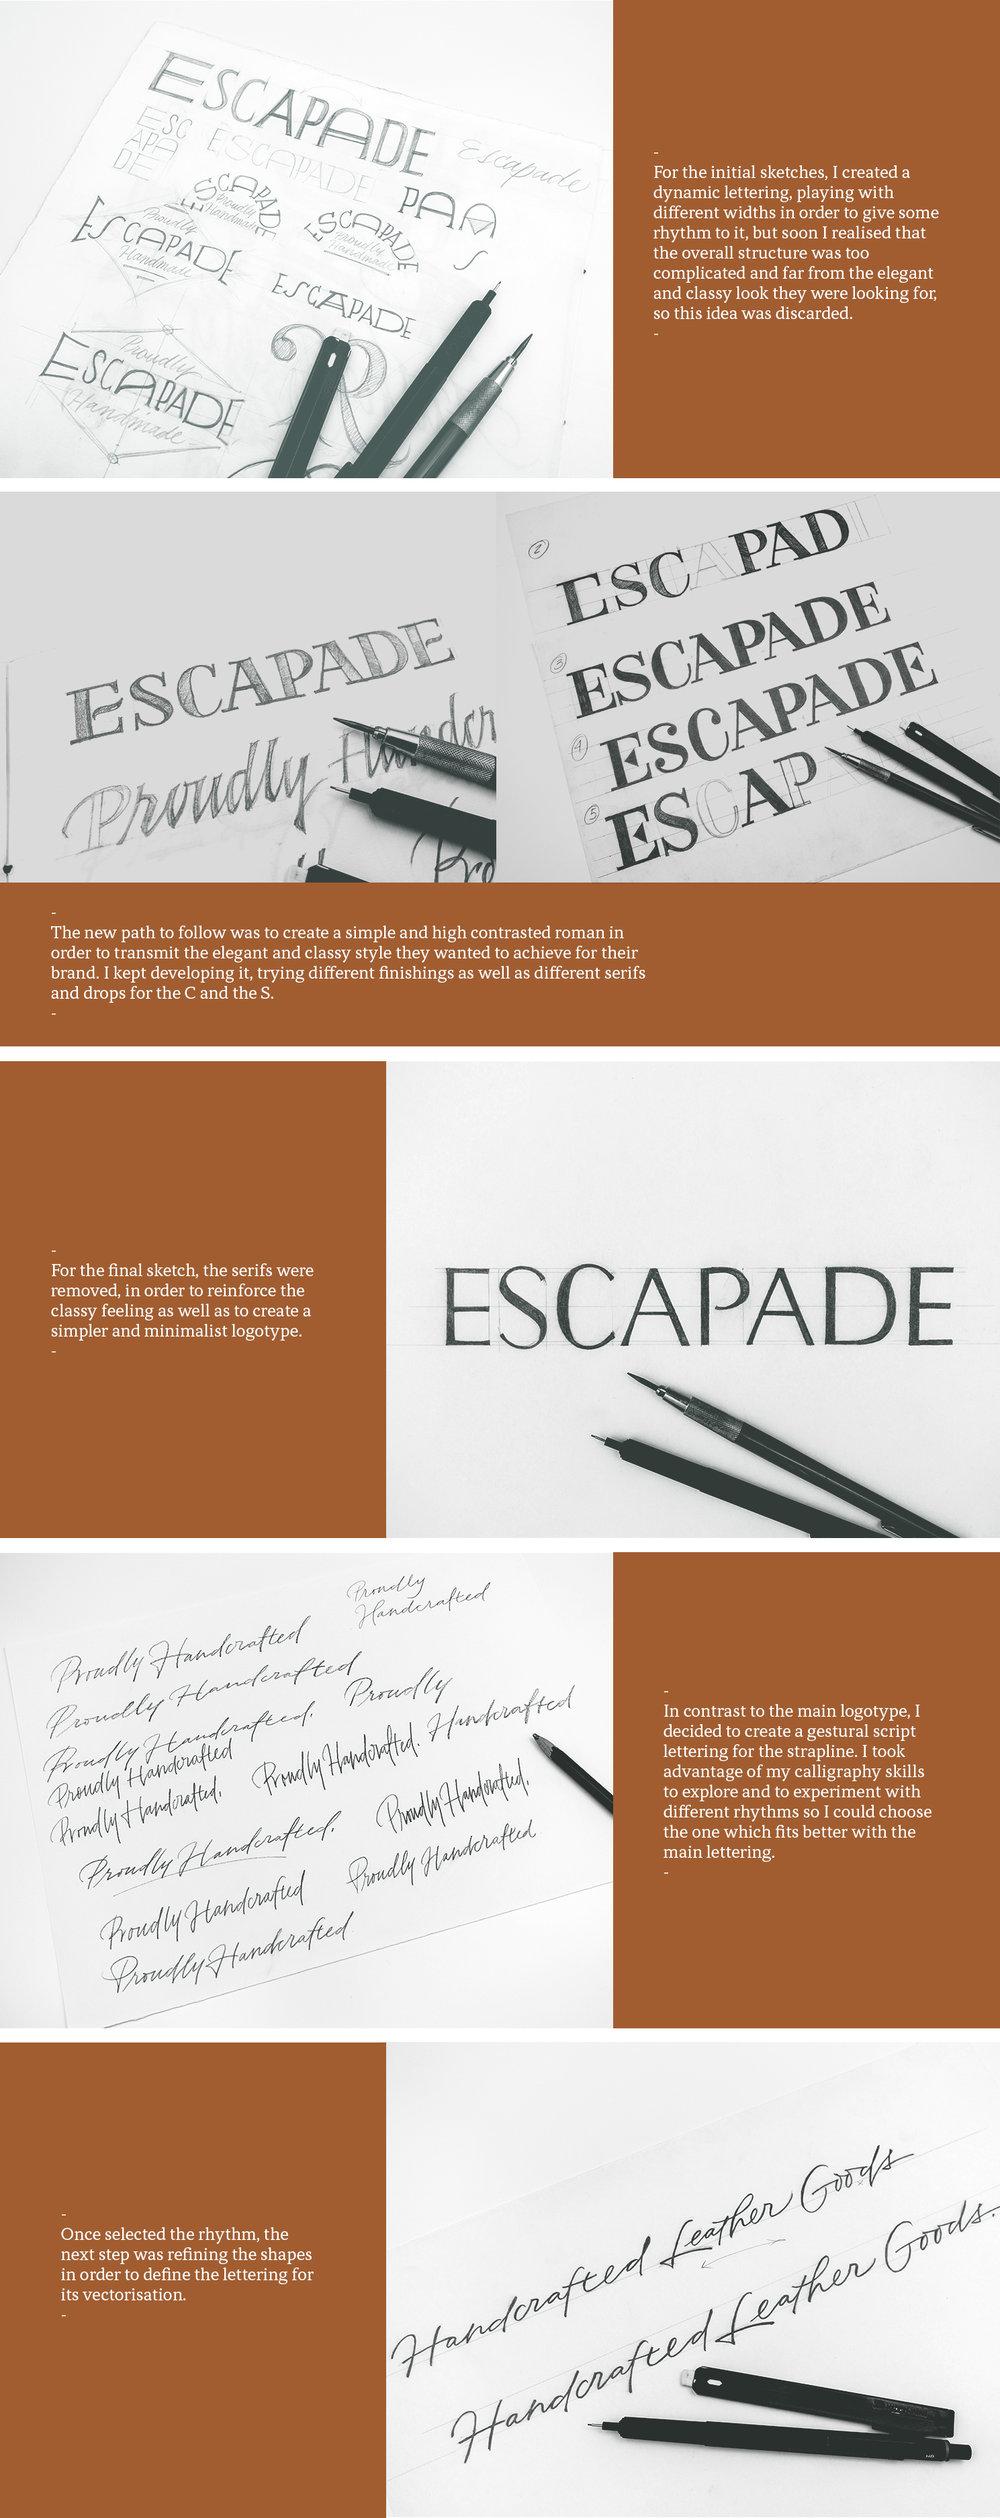 Escapade-Lettering-logo-process-Joan-Quiros.jpg